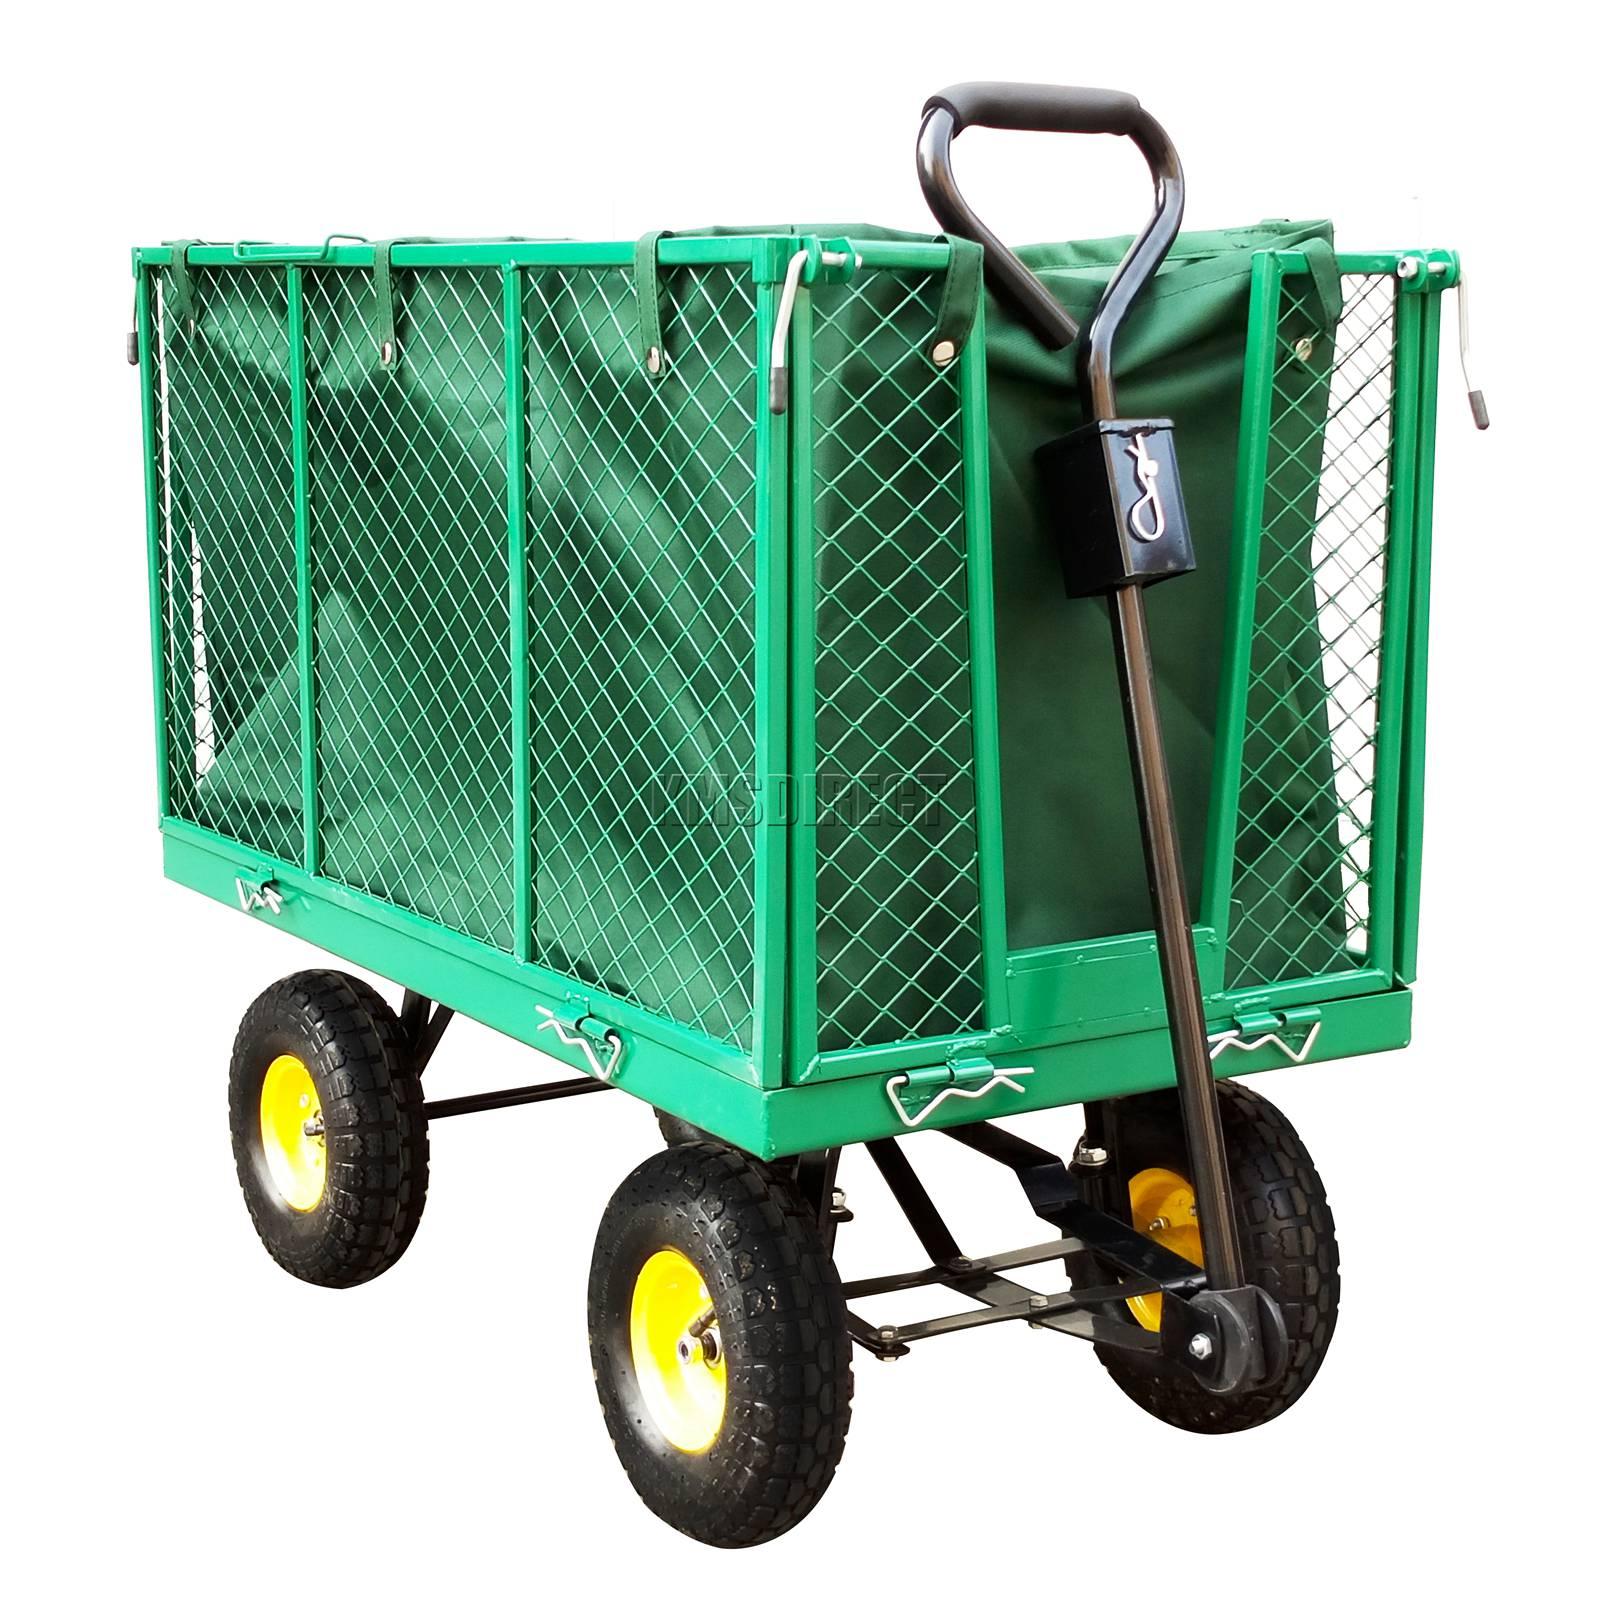 FoxHunter-Heavy-Duty-Garden-Dump-Truck-Tipping-Trailer-Trolley-Cart-Wheelbarrow miniatuur 14